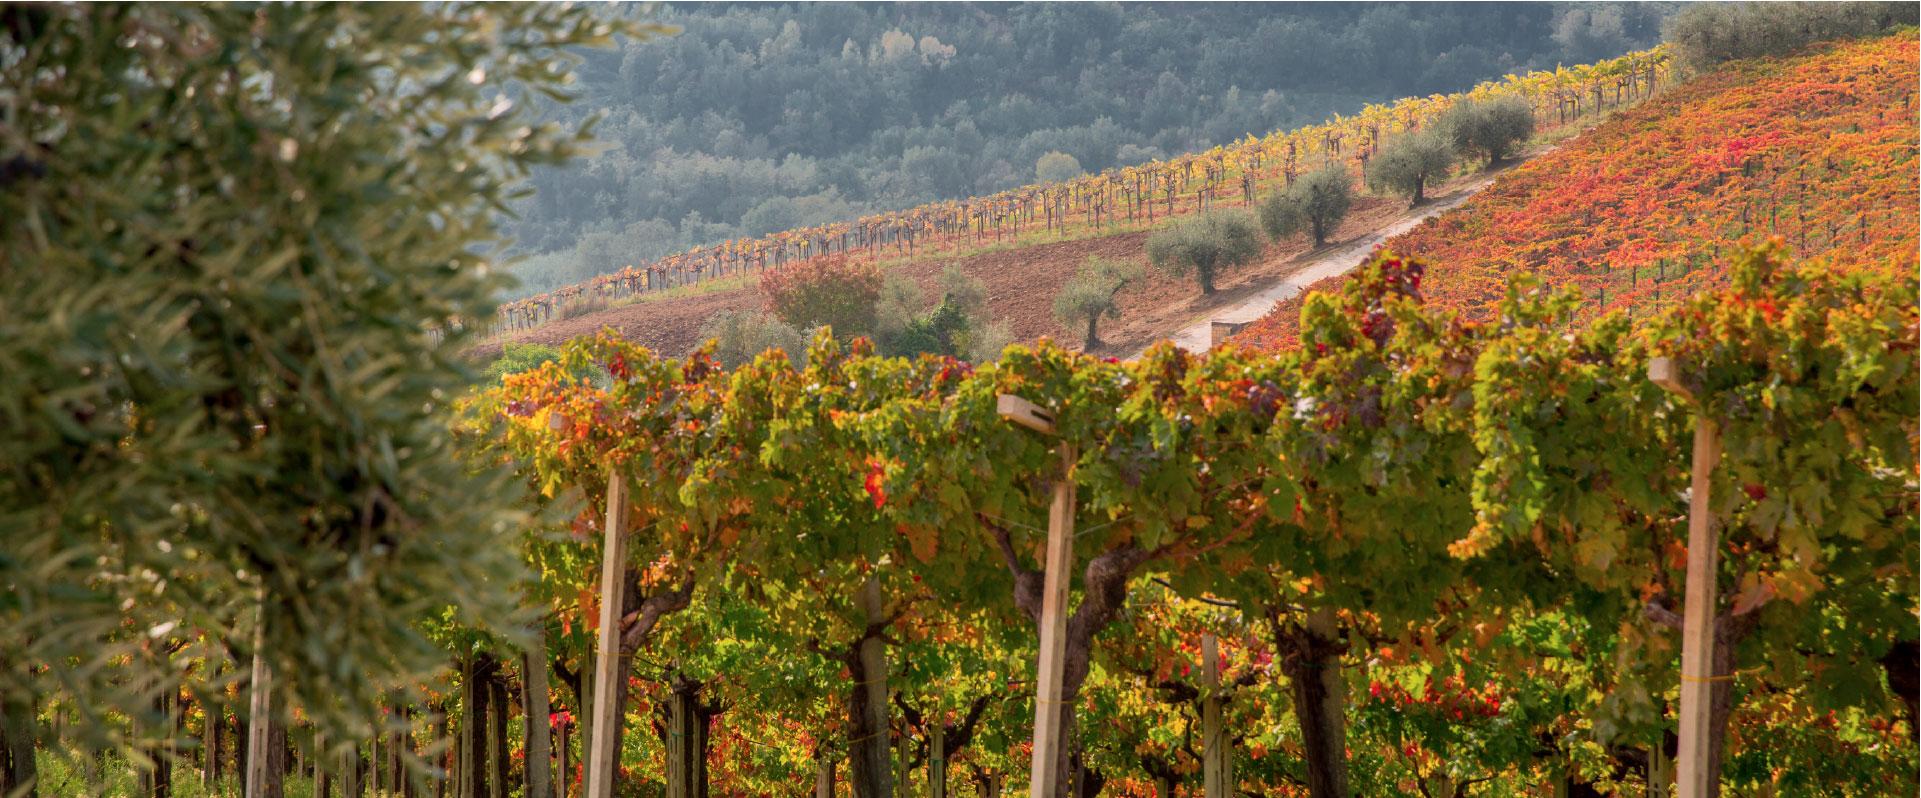 tenuta masciangelo vineyard